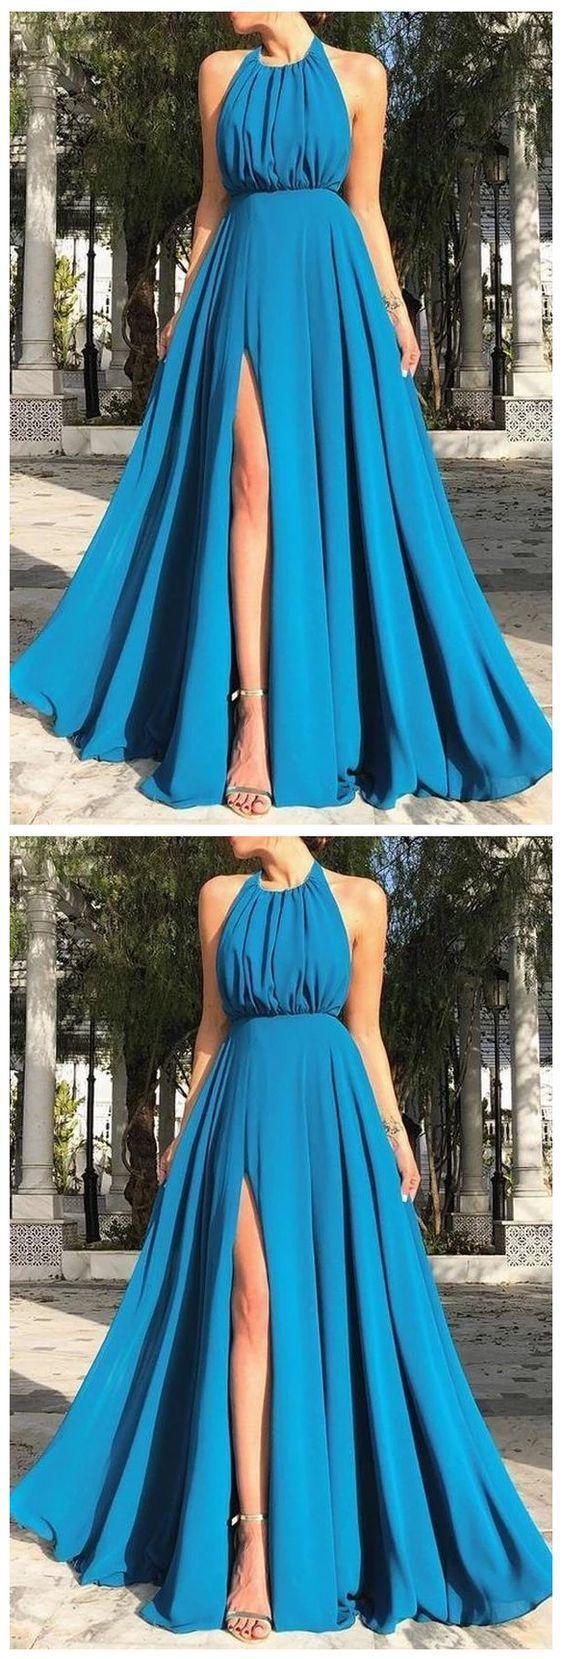 Sexy Sleeveless Halter Open Back Split prom Dress 2700